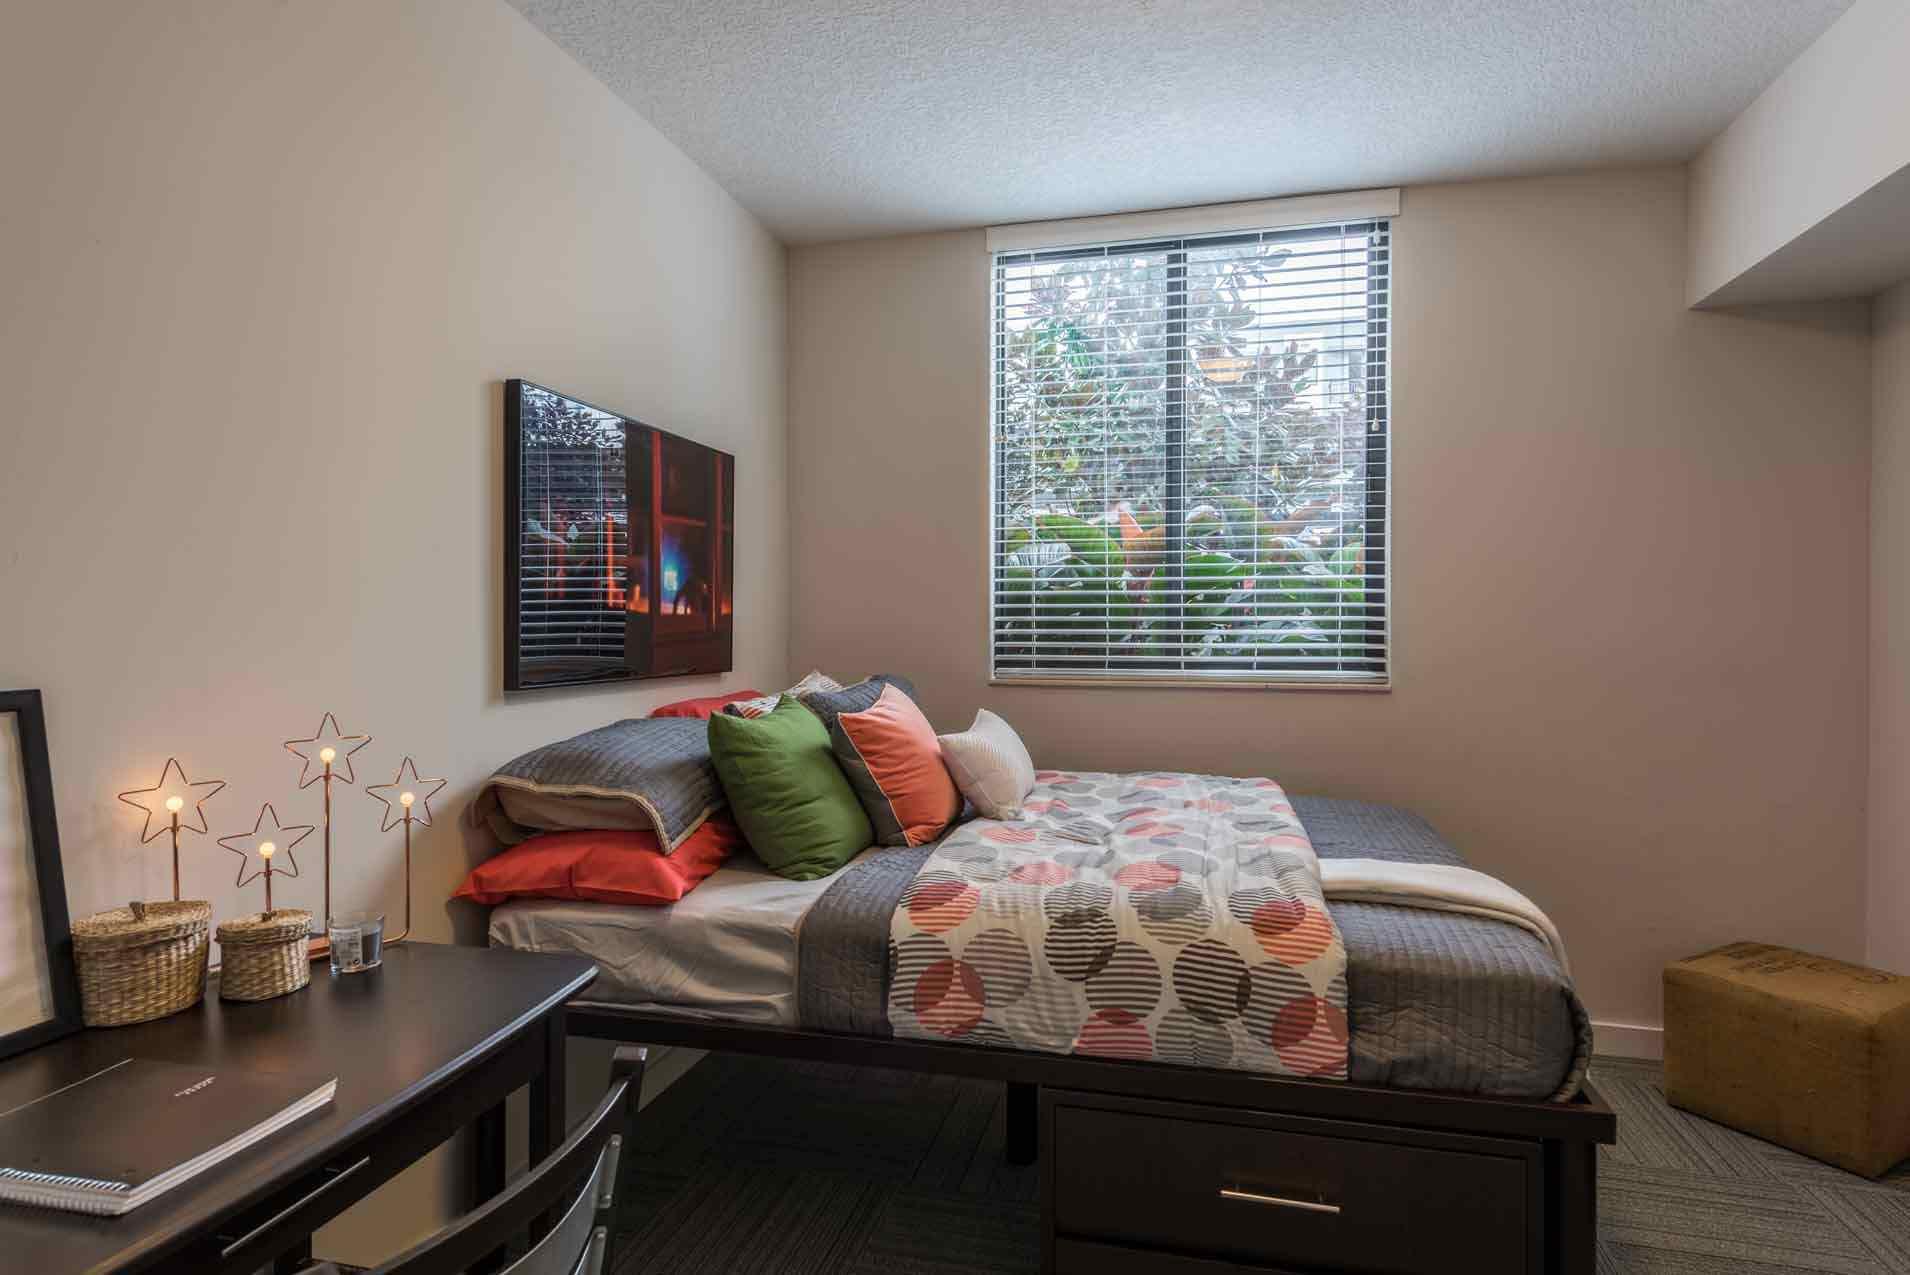 4th-Street-Commons-Miami-Bedroom2-Unilodgers